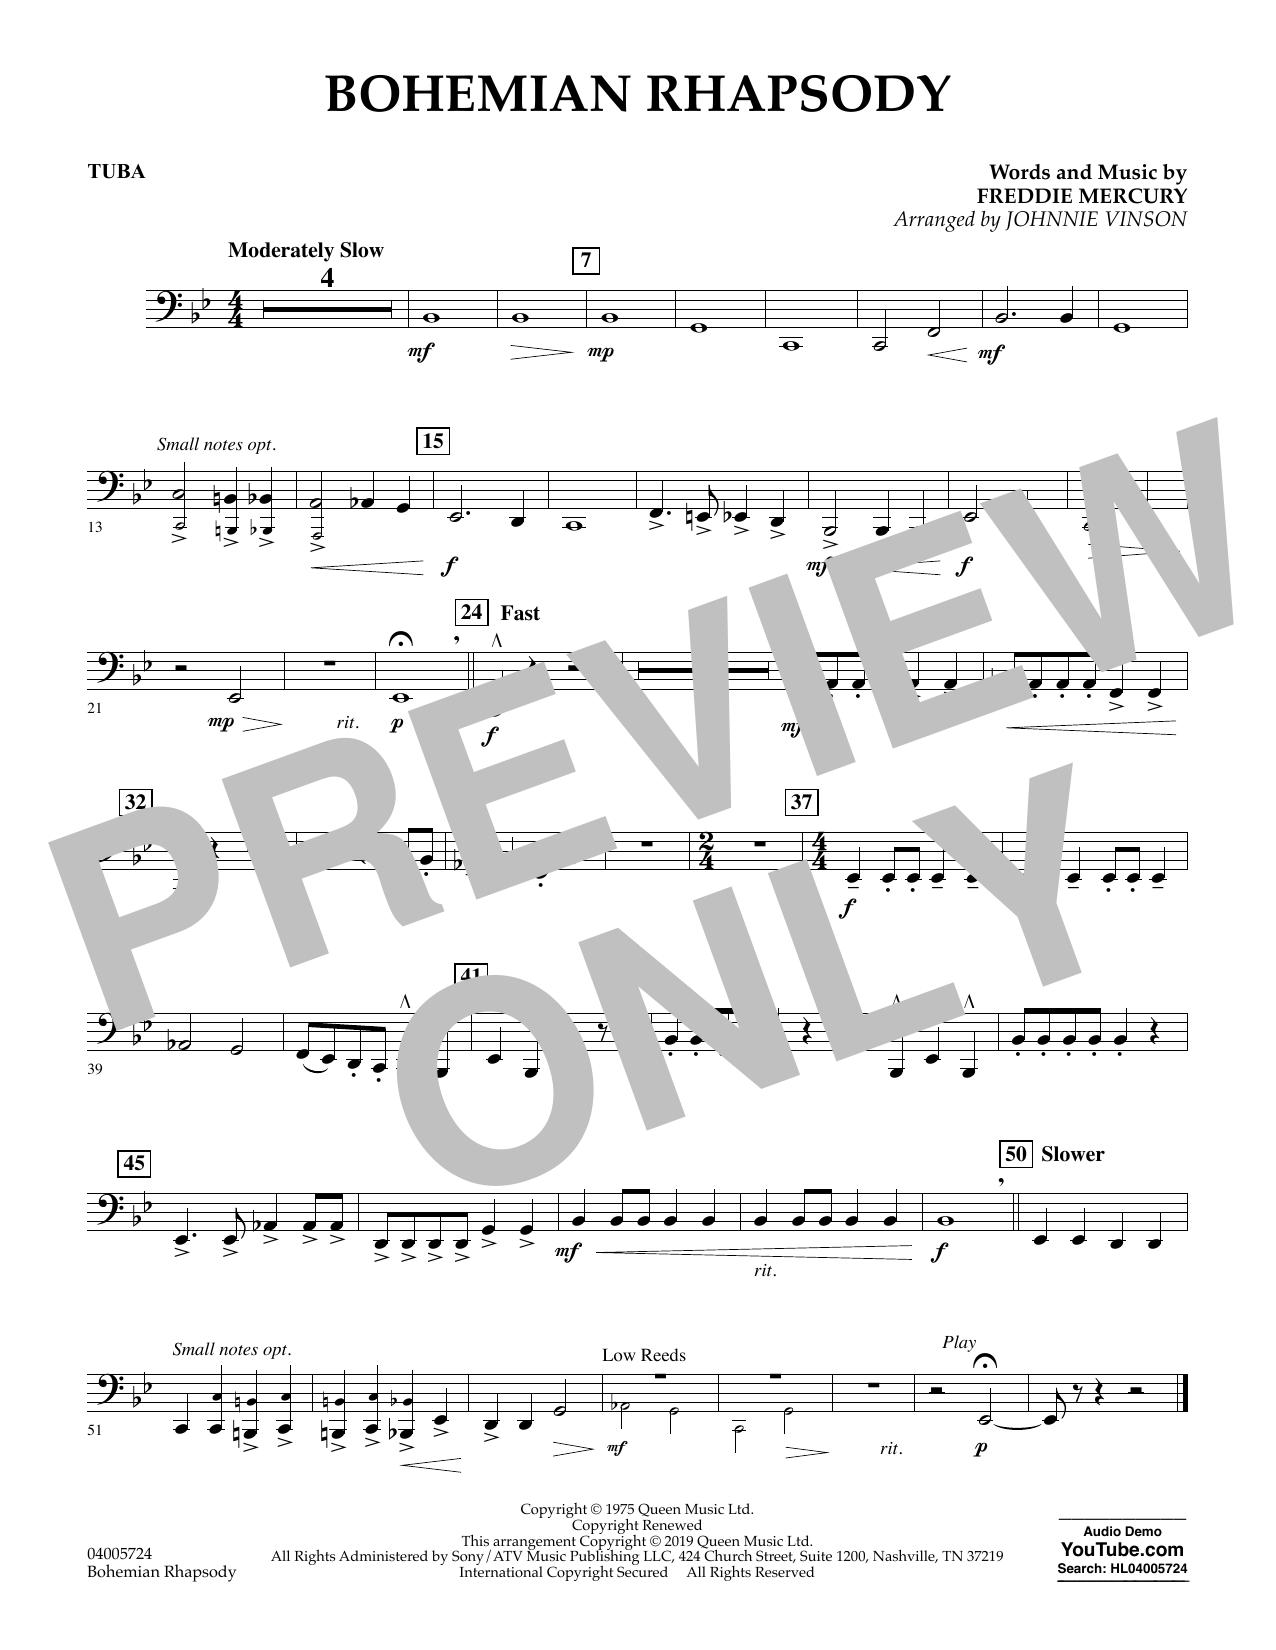 Bohemian Rhapsody (arr. Johnnie Vinson) - Tuba (Concert Band)